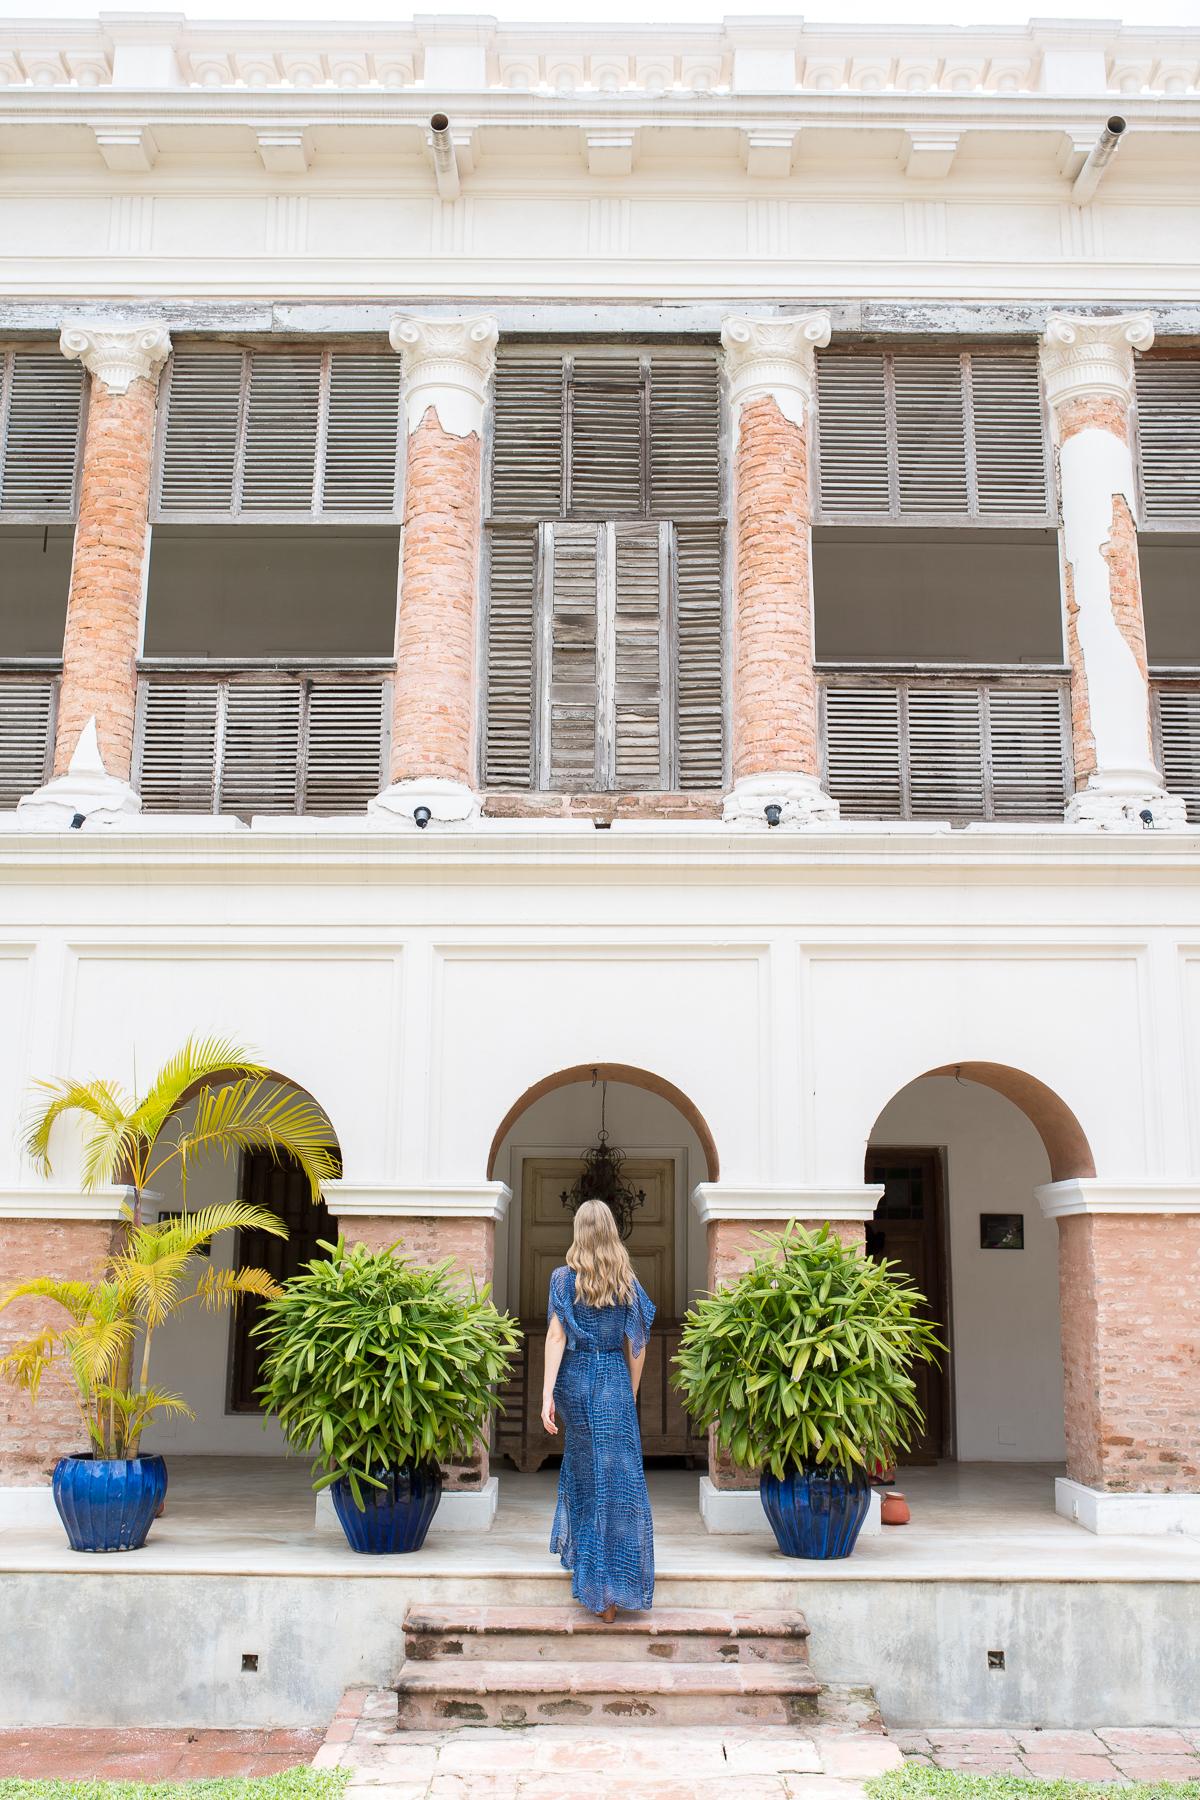 Stacie Flinner The Rajbari Bawali Heritage Hotel Calcutta-39.jpg